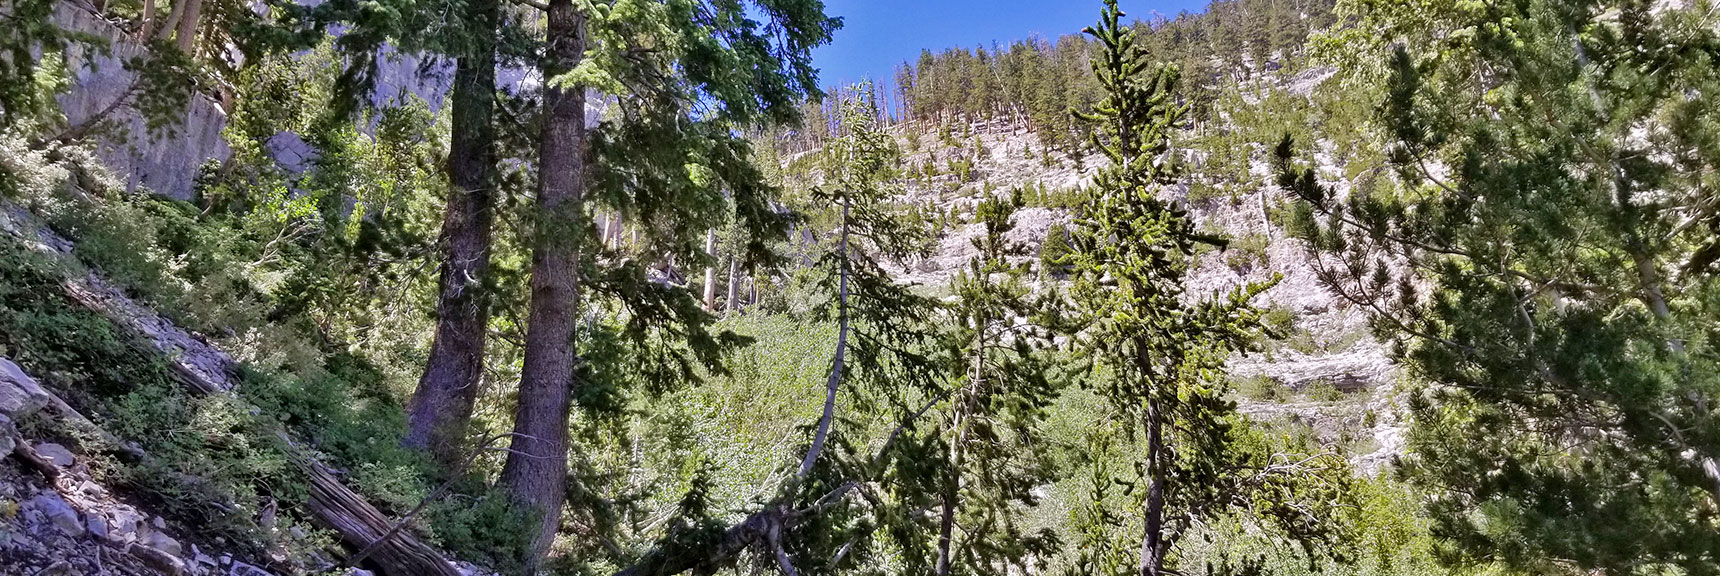 Avalanche Slope Along Base of Cliff Heading Up Canyon Wash | Cathedral Rock to South Ridge Kyle Canyon Summit, Nevada